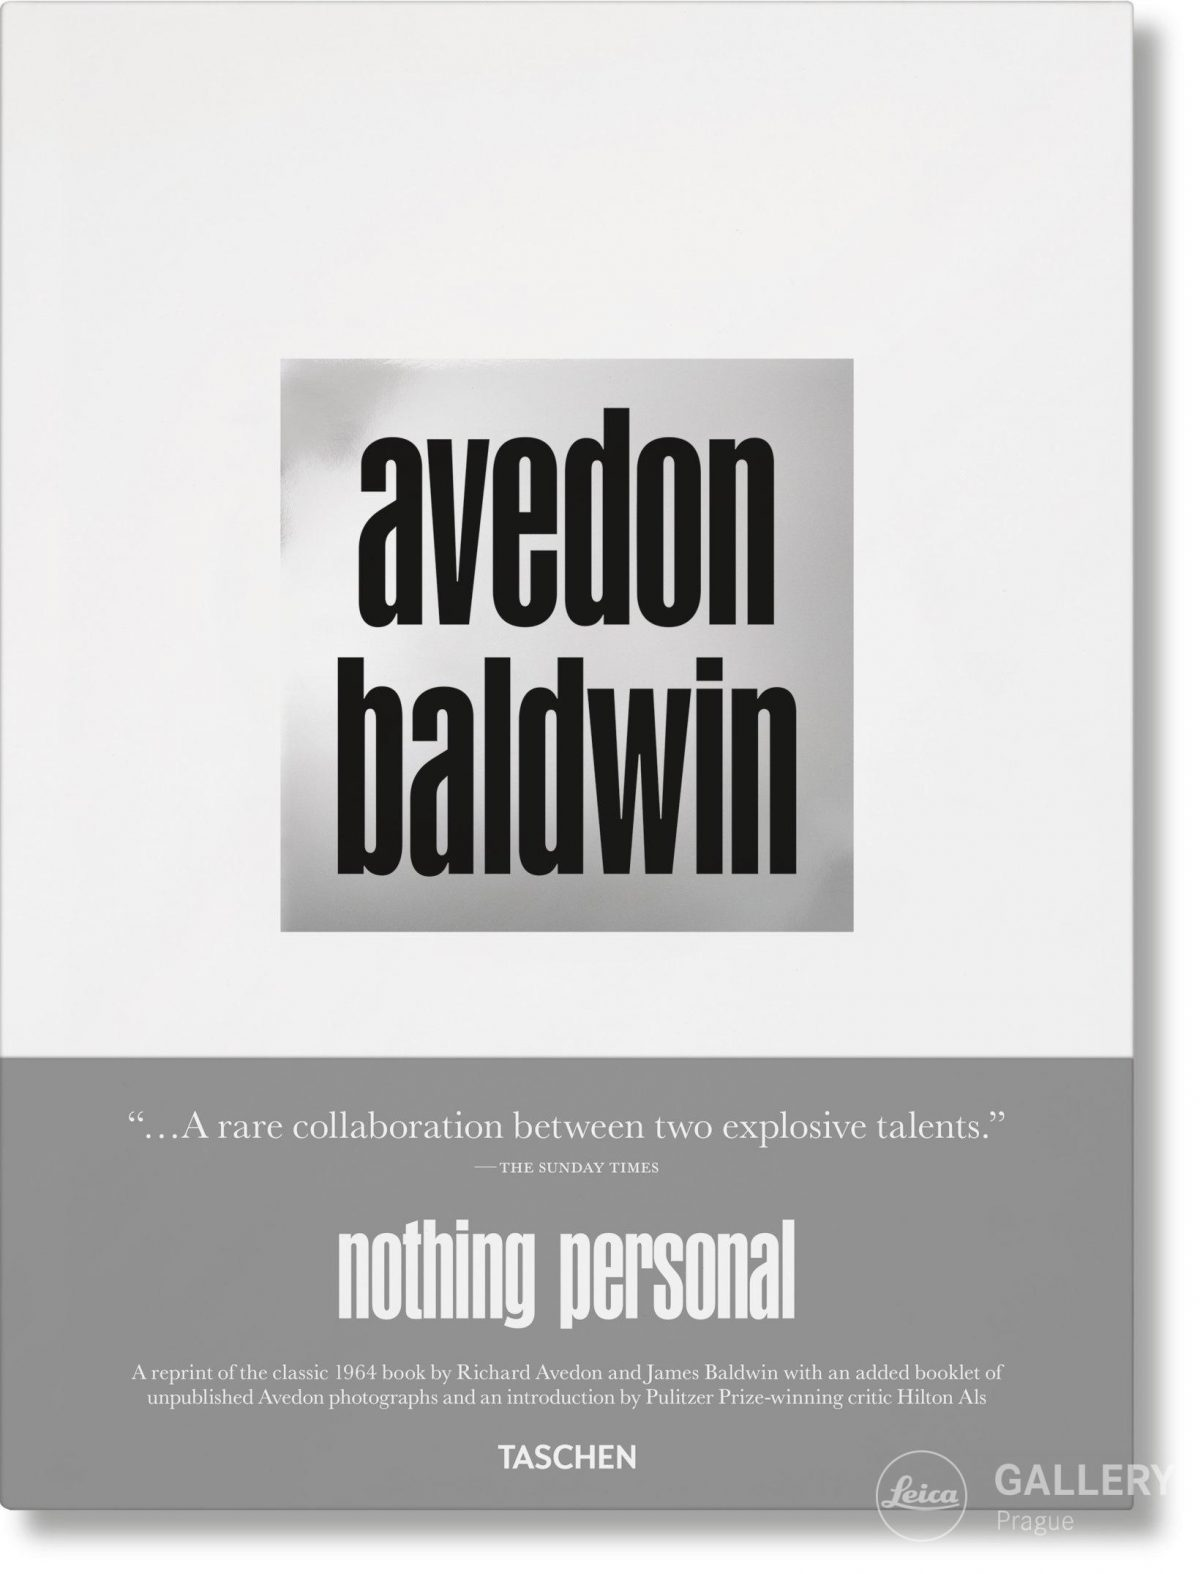 Avedon, Baldvin